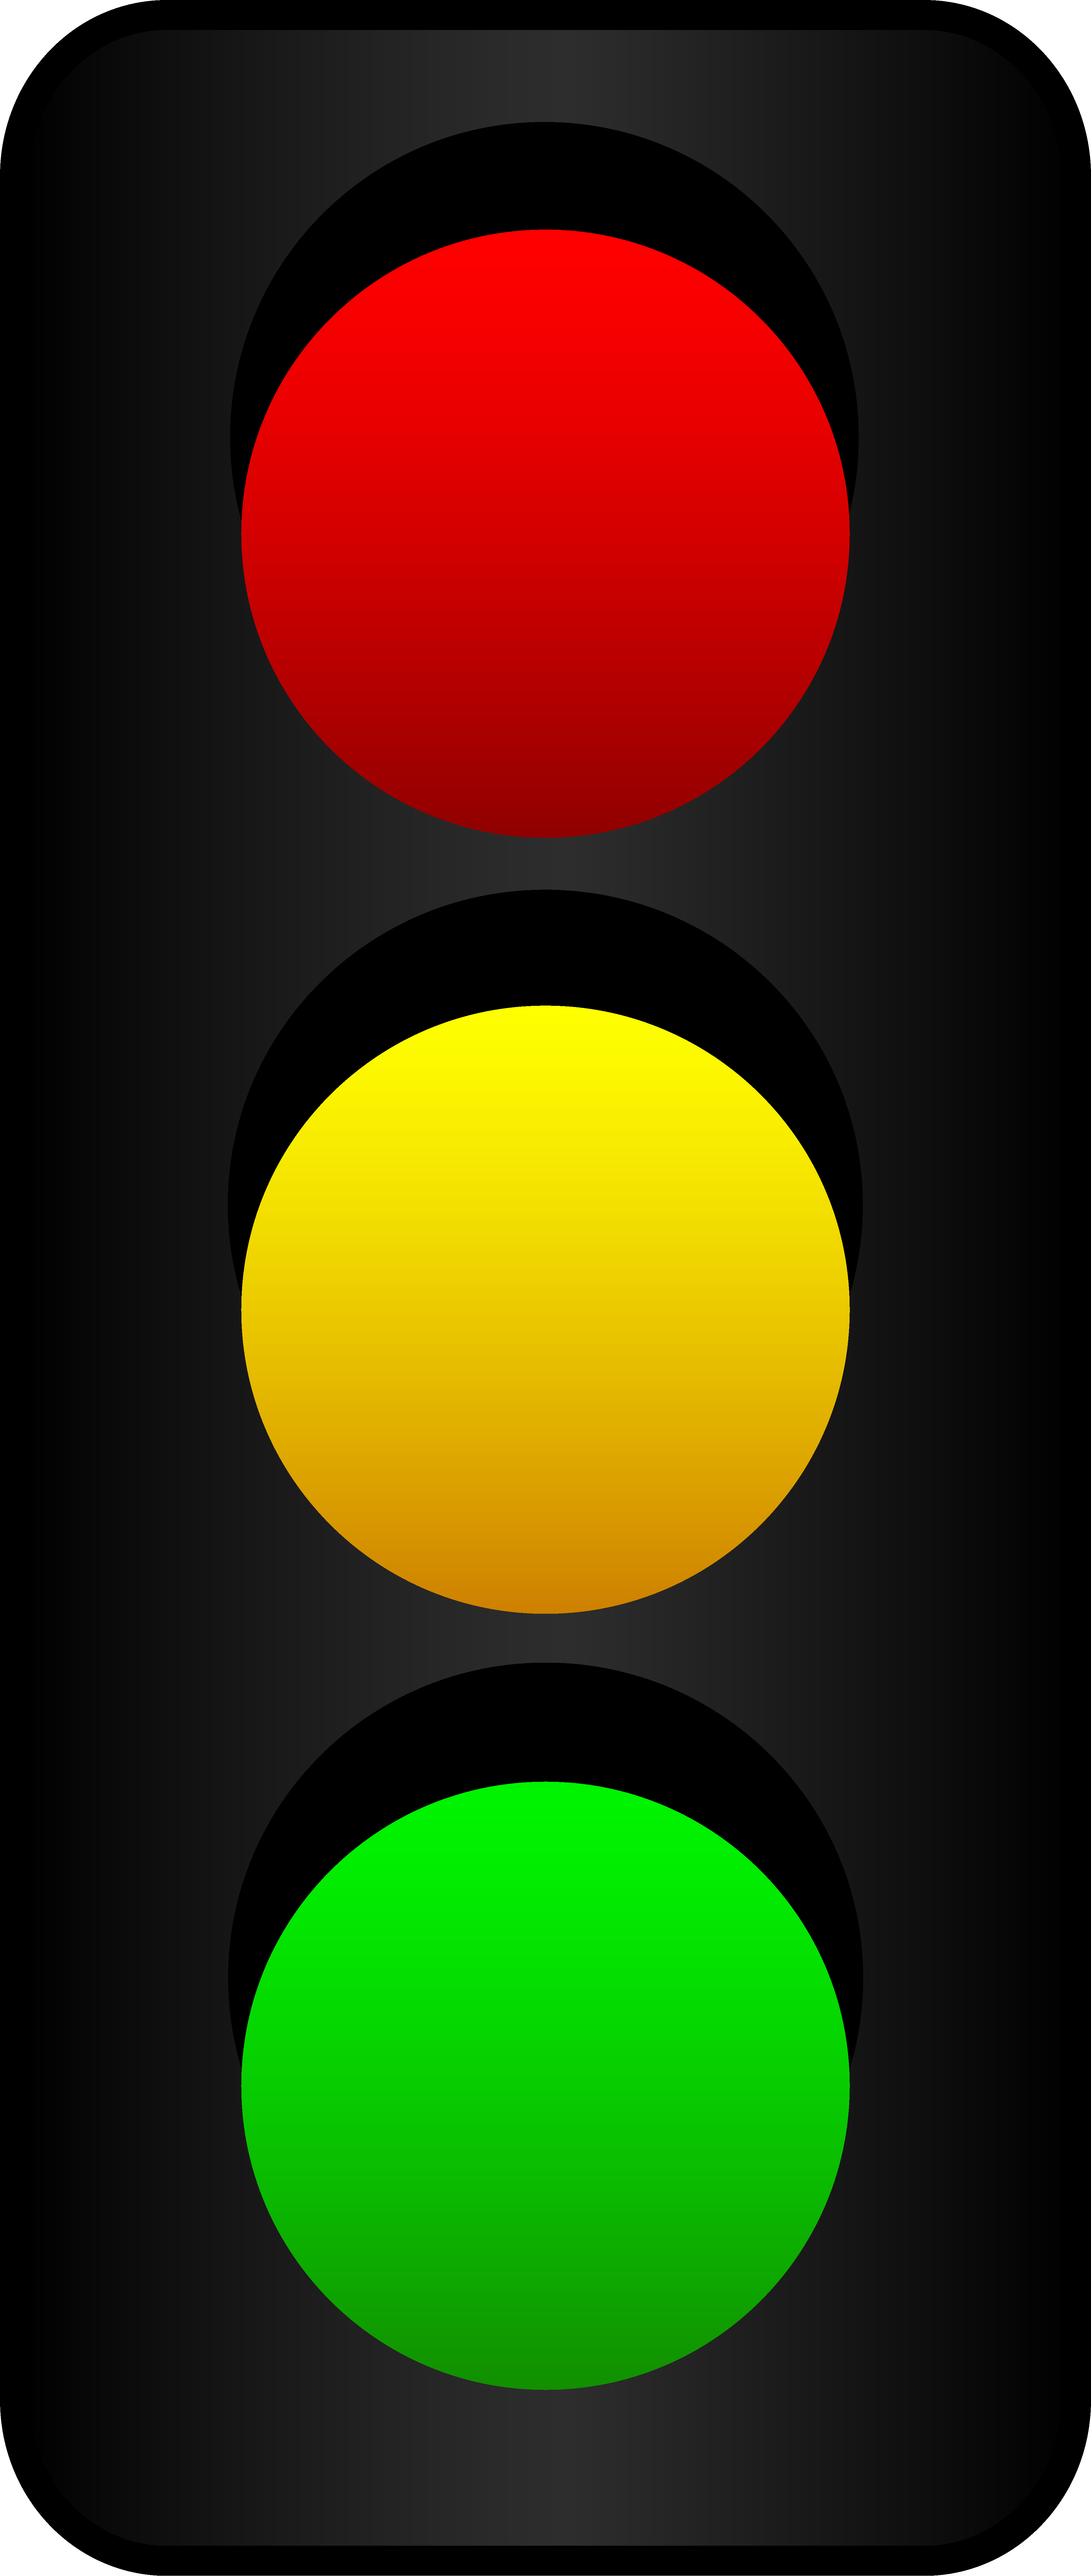 Free Cartoon Traffic Light, Download Free Clip Art, Free.